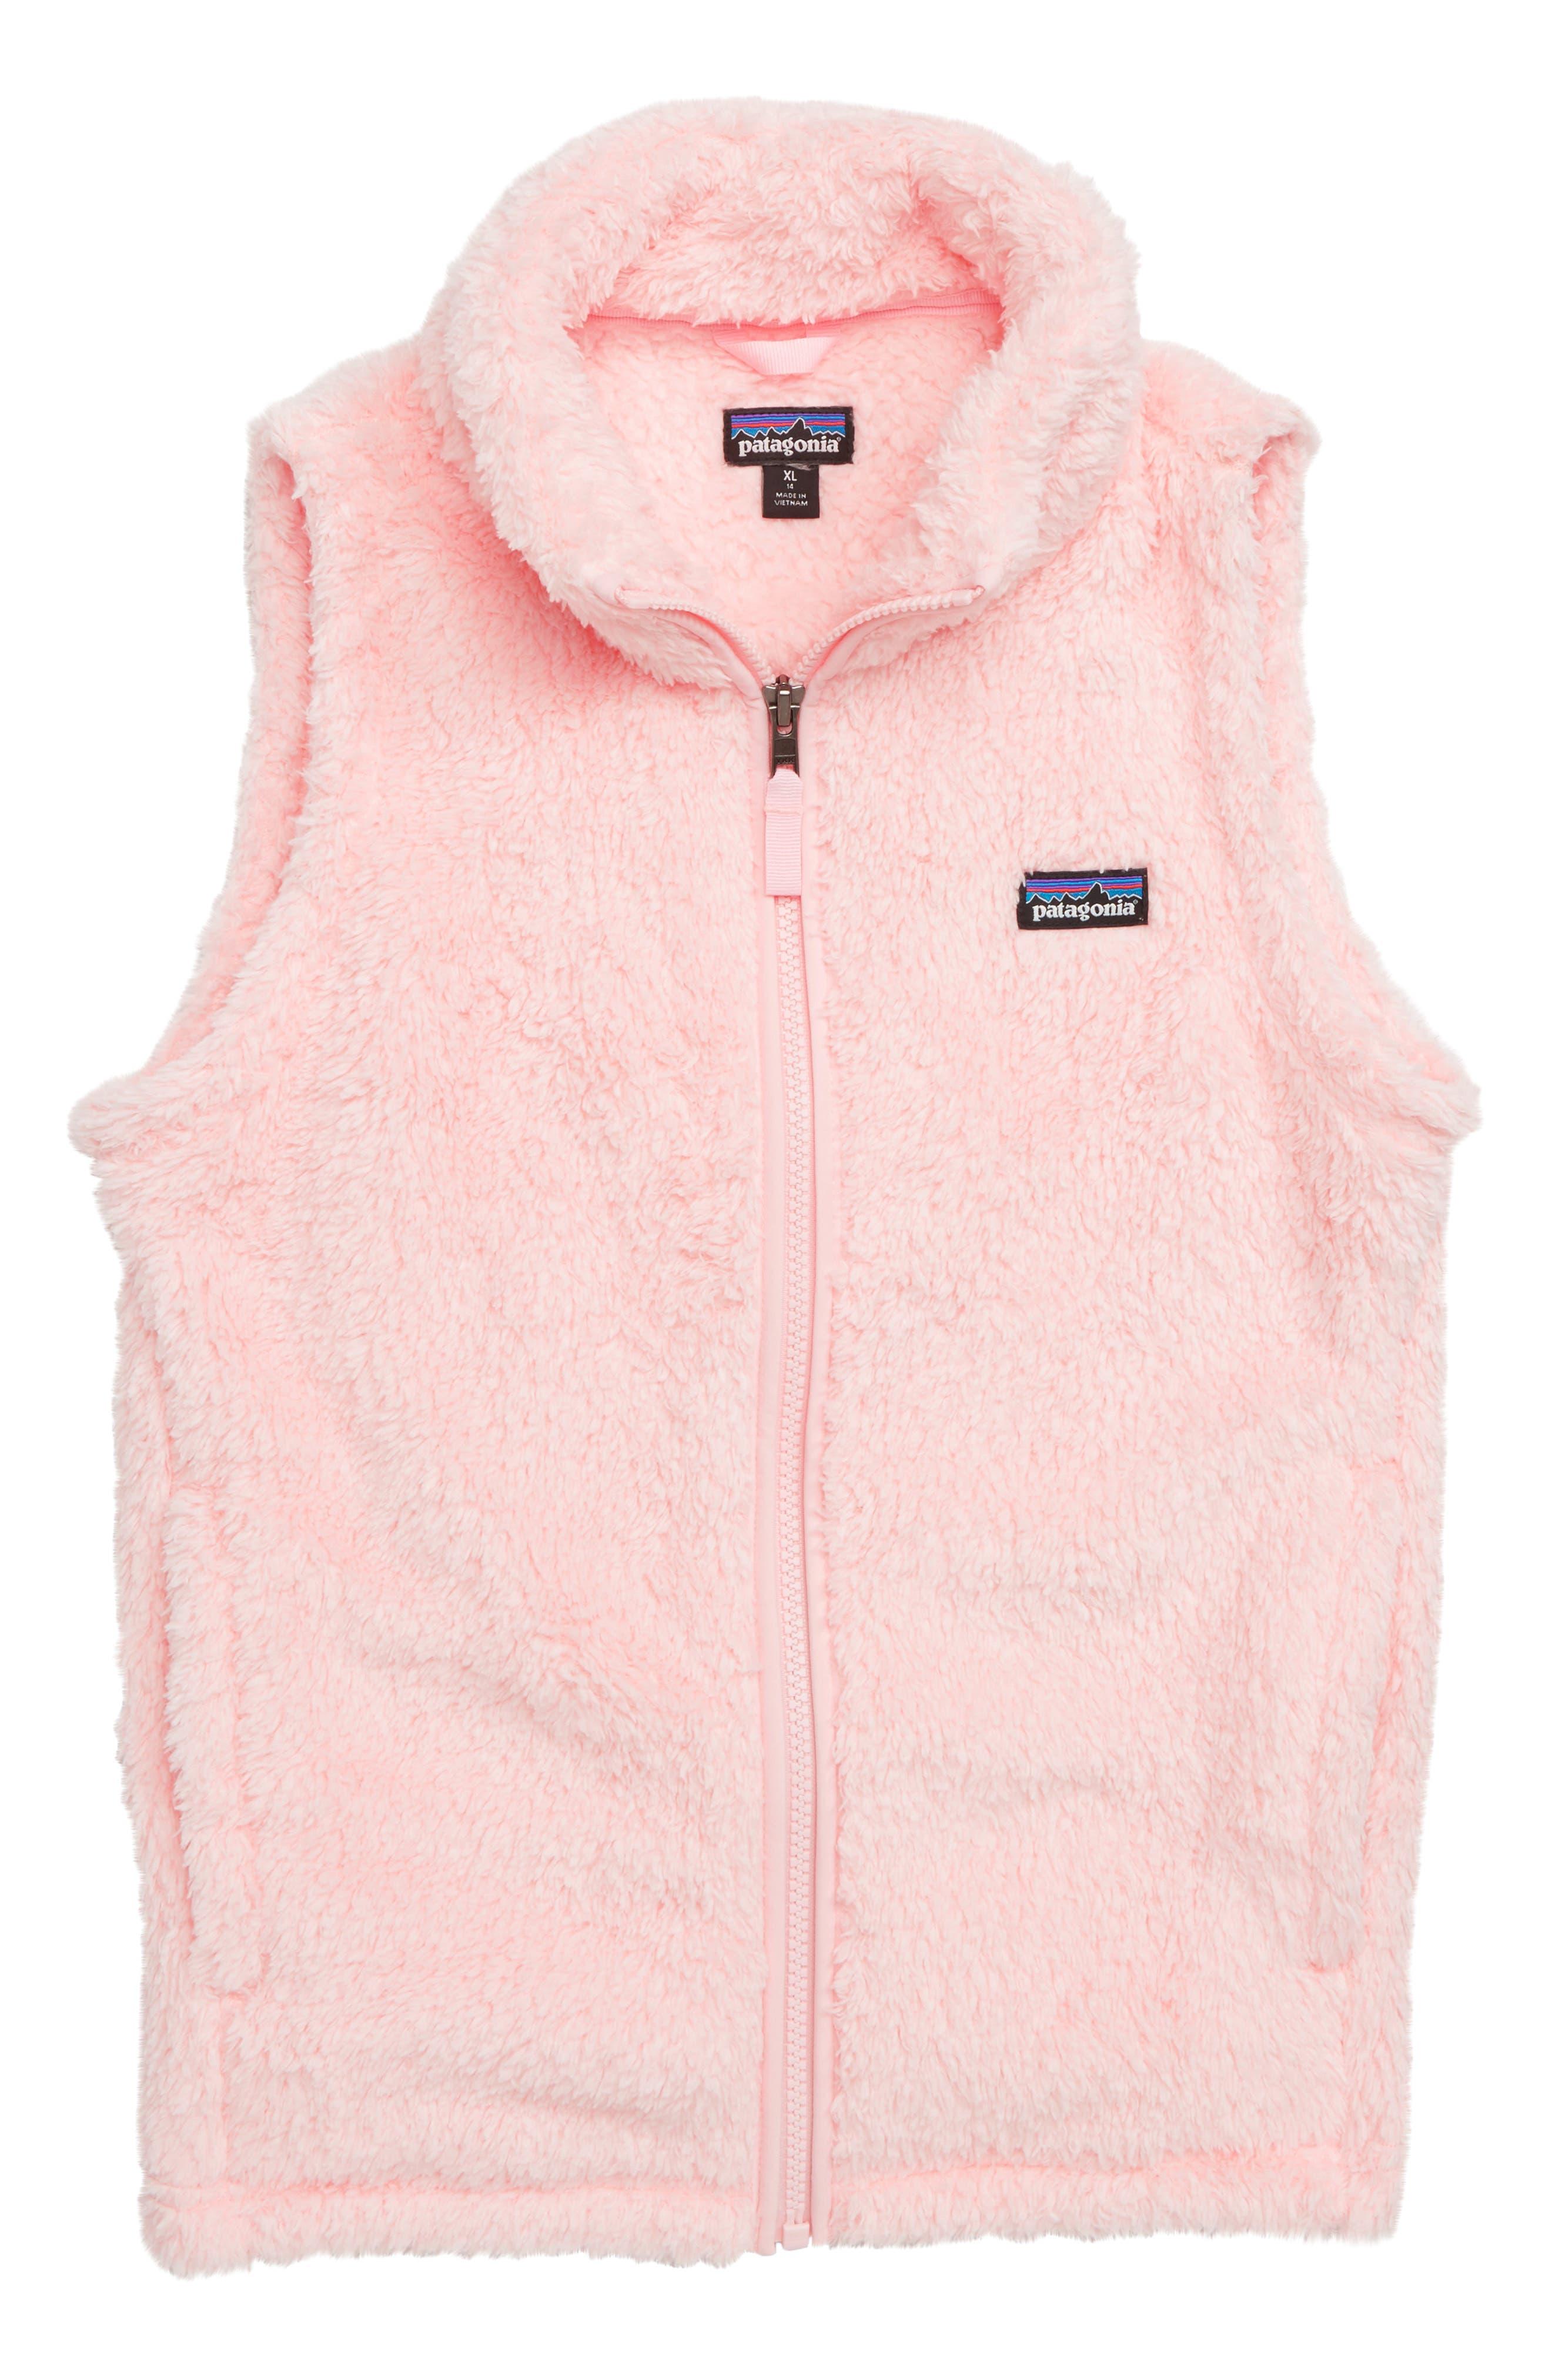 6165ebea5 Kids' Vests Apparel: T-Shirts, Jeans, Pants & Hoodies | Nordstrom